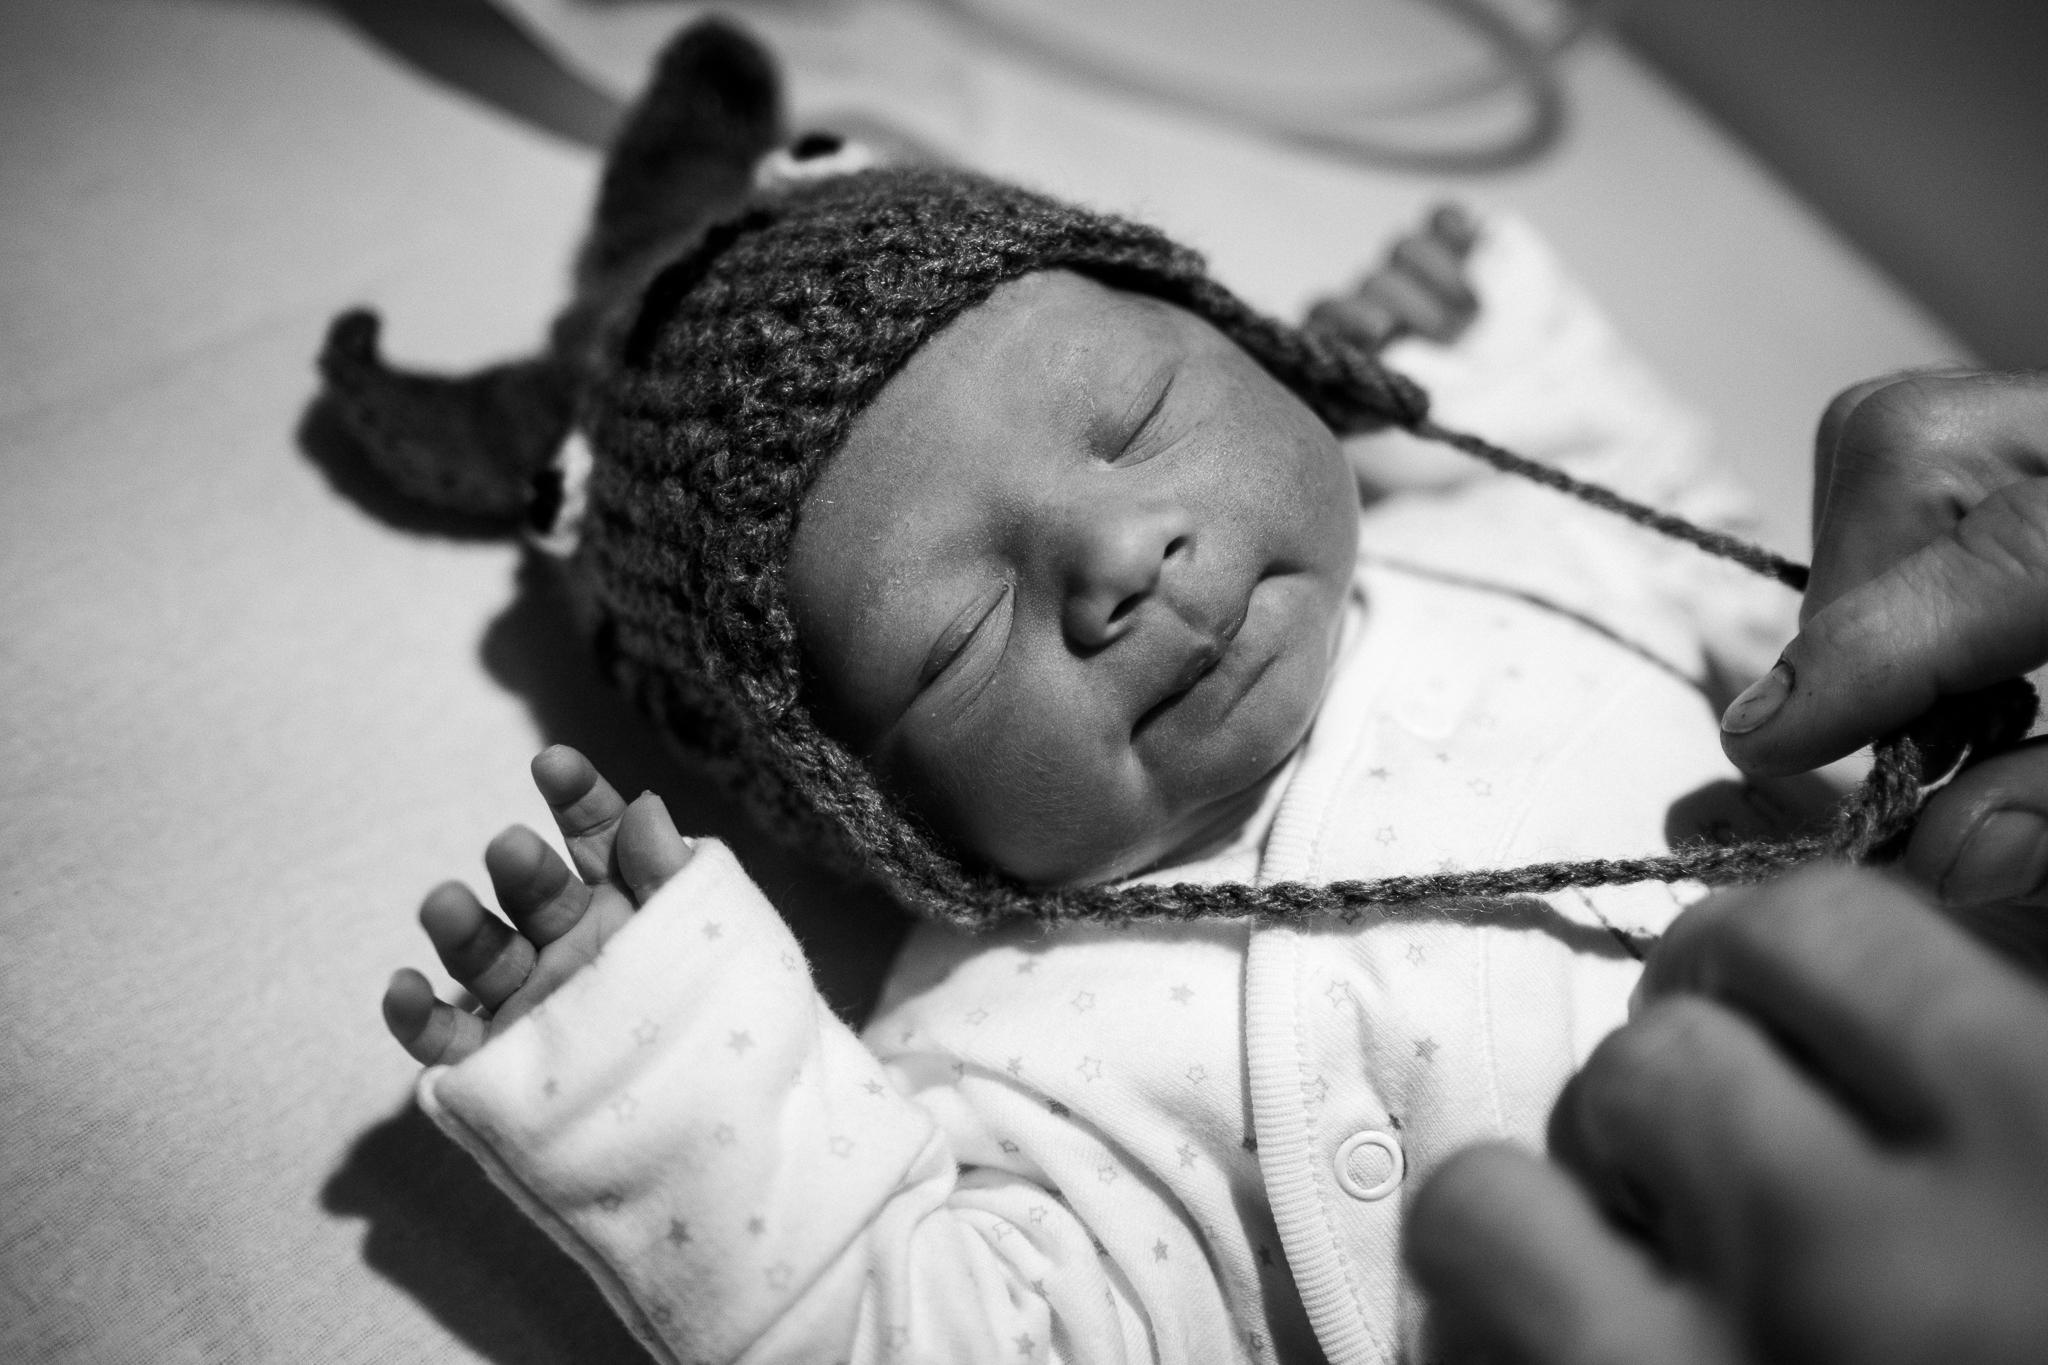 Birth Photographer Documentary Photography Newborn Baby Hospital Family - Jenny Harper-32.jpg